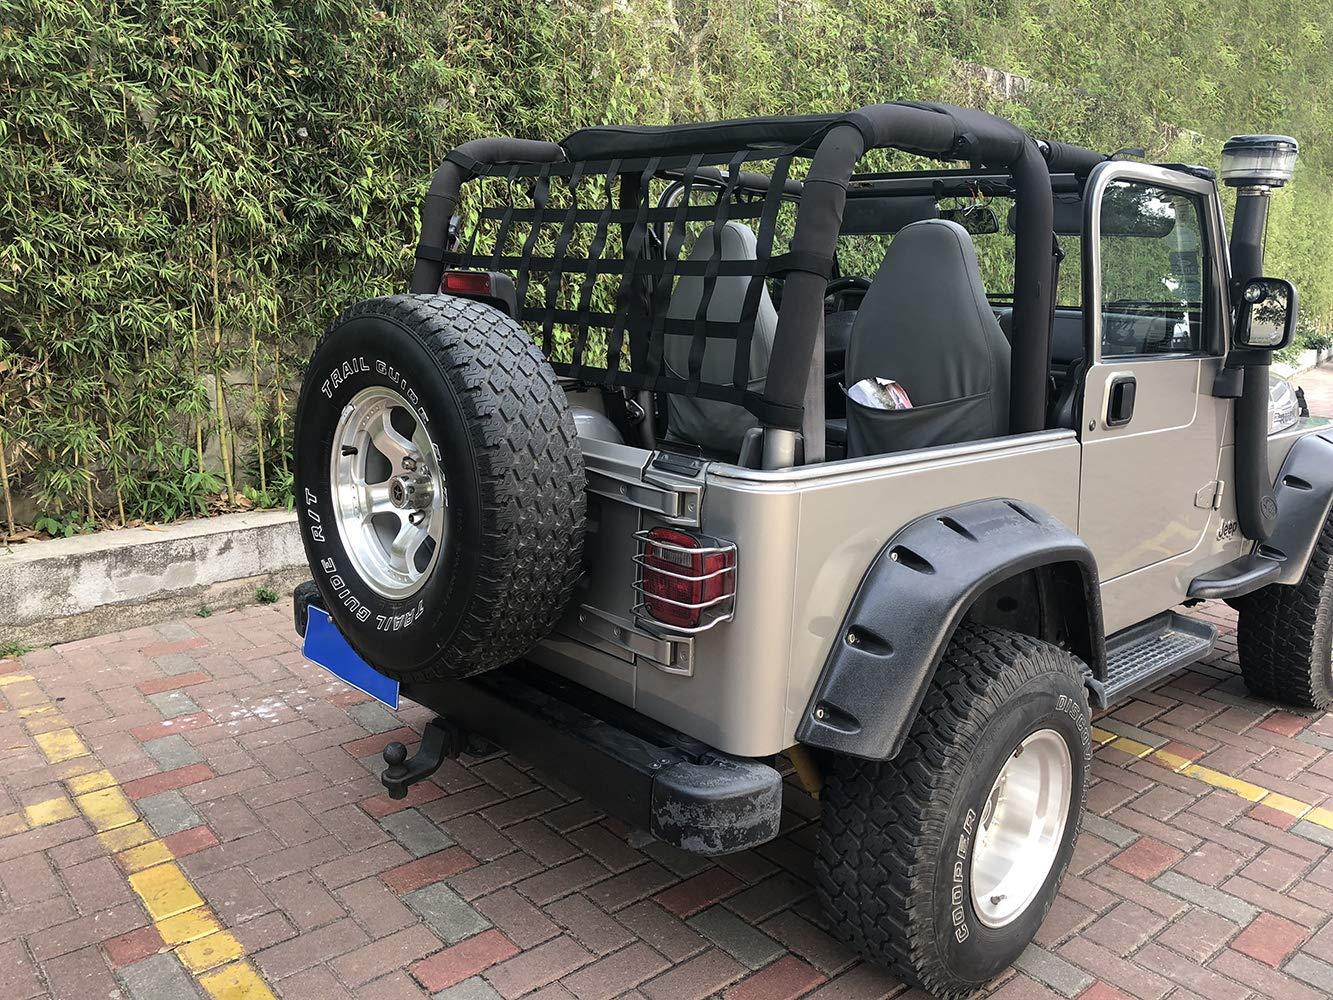 Sukemichi Jeep Wrangler Cargo Net,Fabric Roof Net for Jeep TJ JK JL Sahara Rubicon 1997-2018